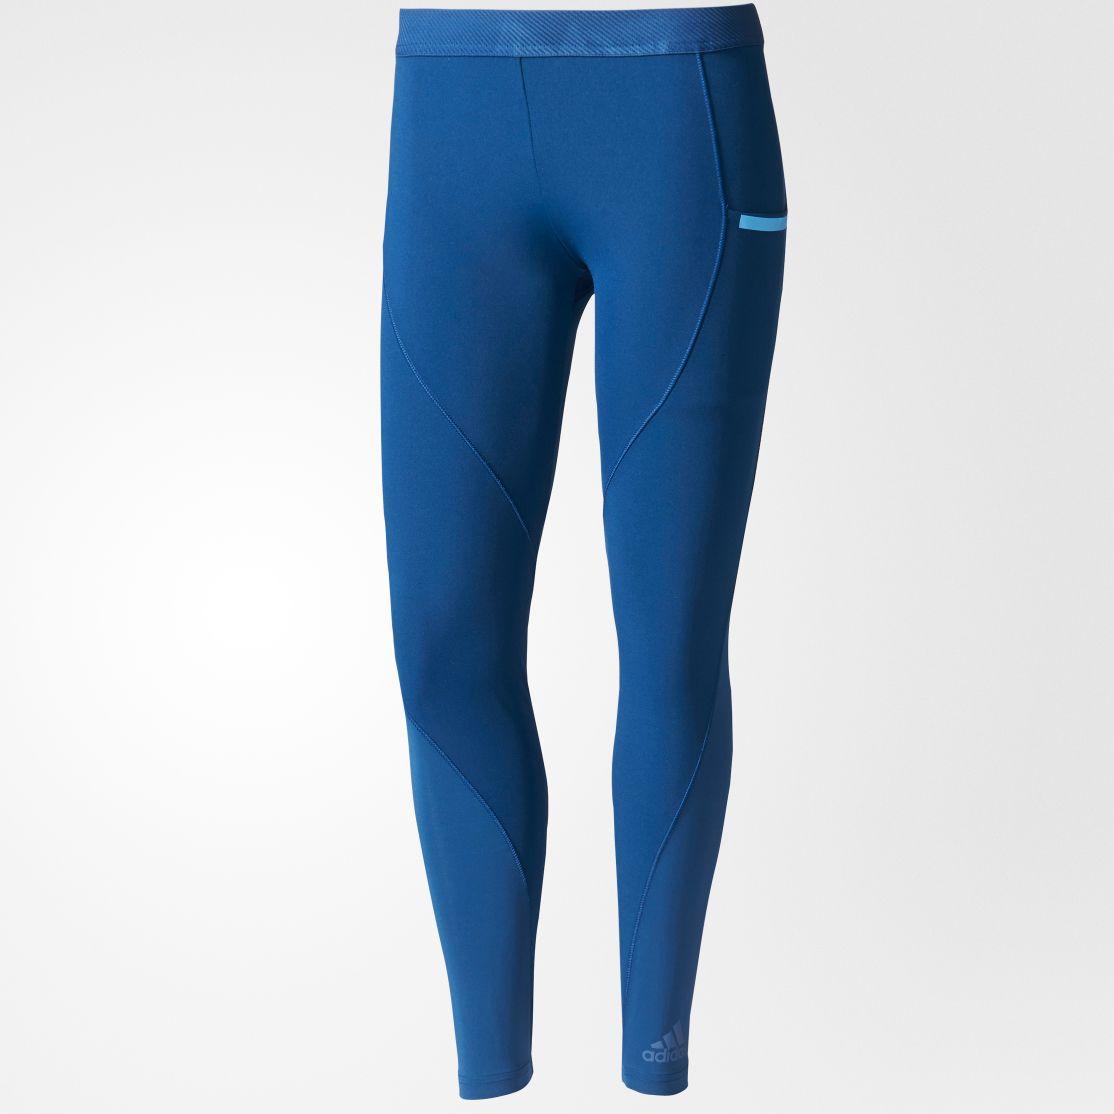 de2d5cb3950 Best womens' sportswear - We test out fitness tops and leggings